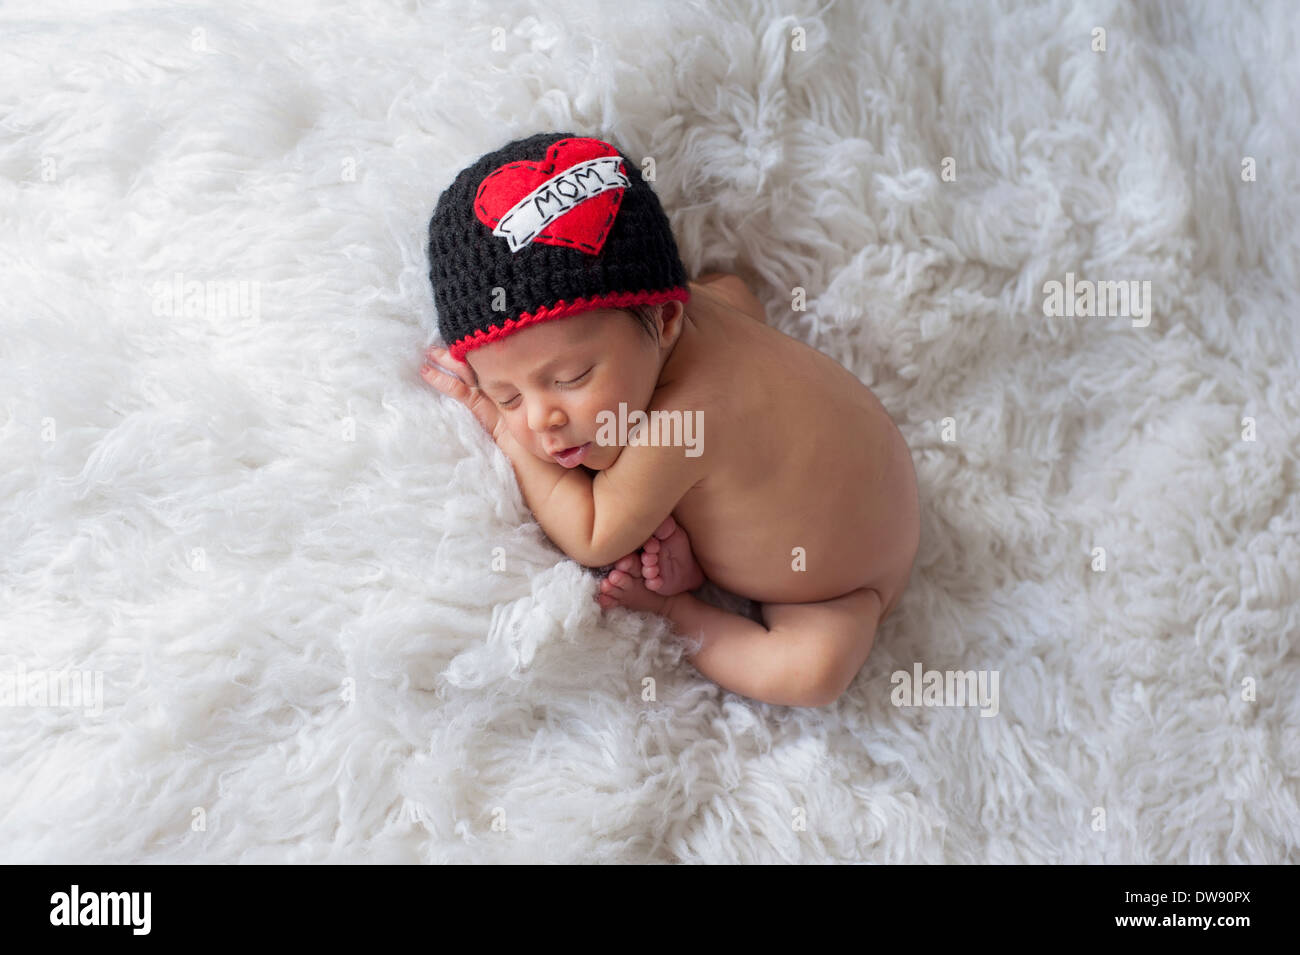 Sleeping baby boy wearing a